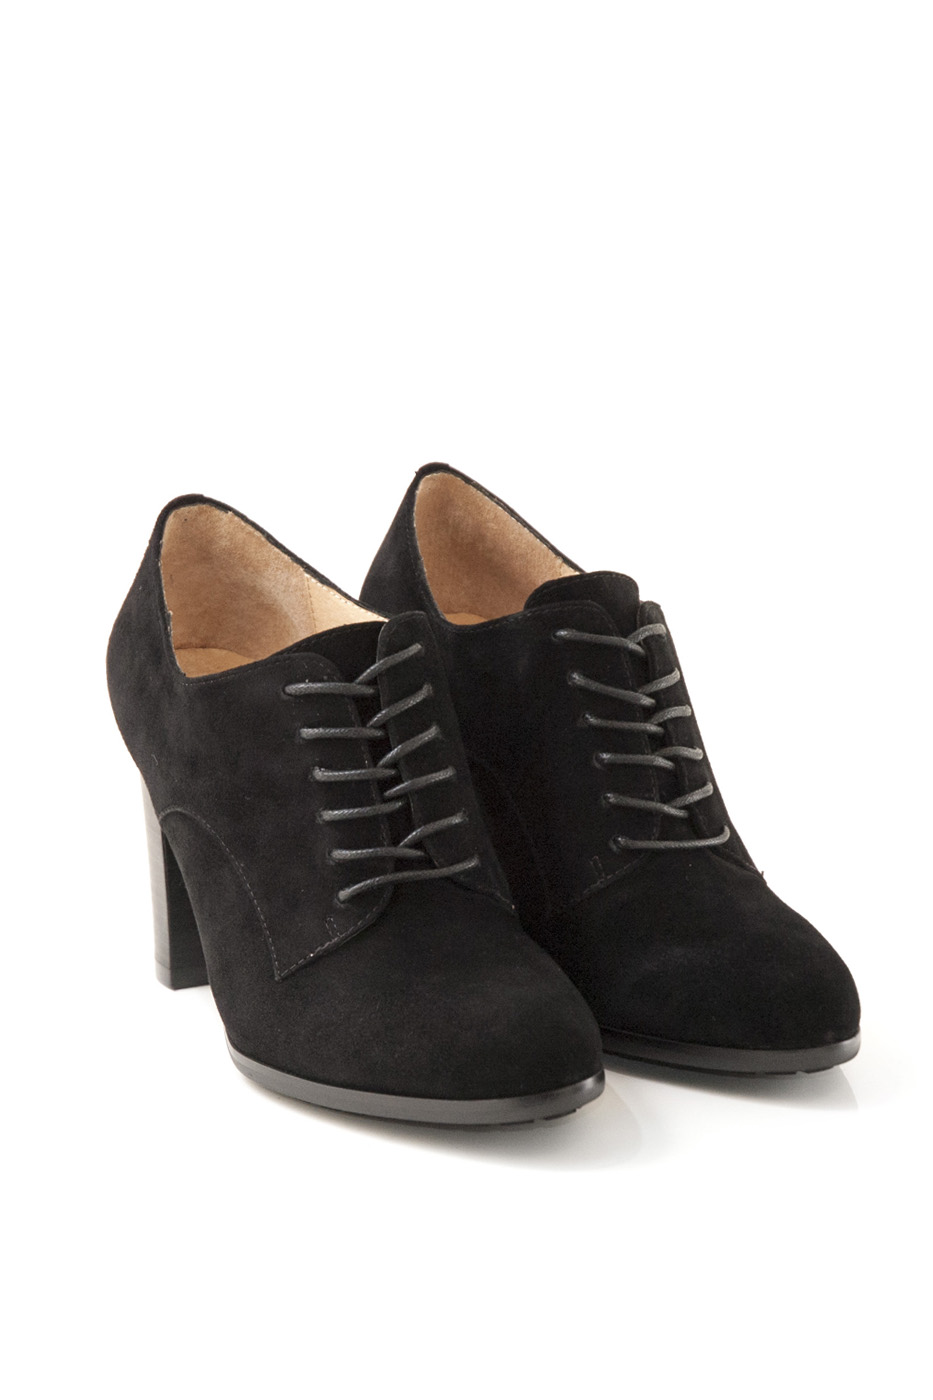 Фото - Ботильоны Valley ботильоны женские giotto цвет черный 1488 812 913 размер 35